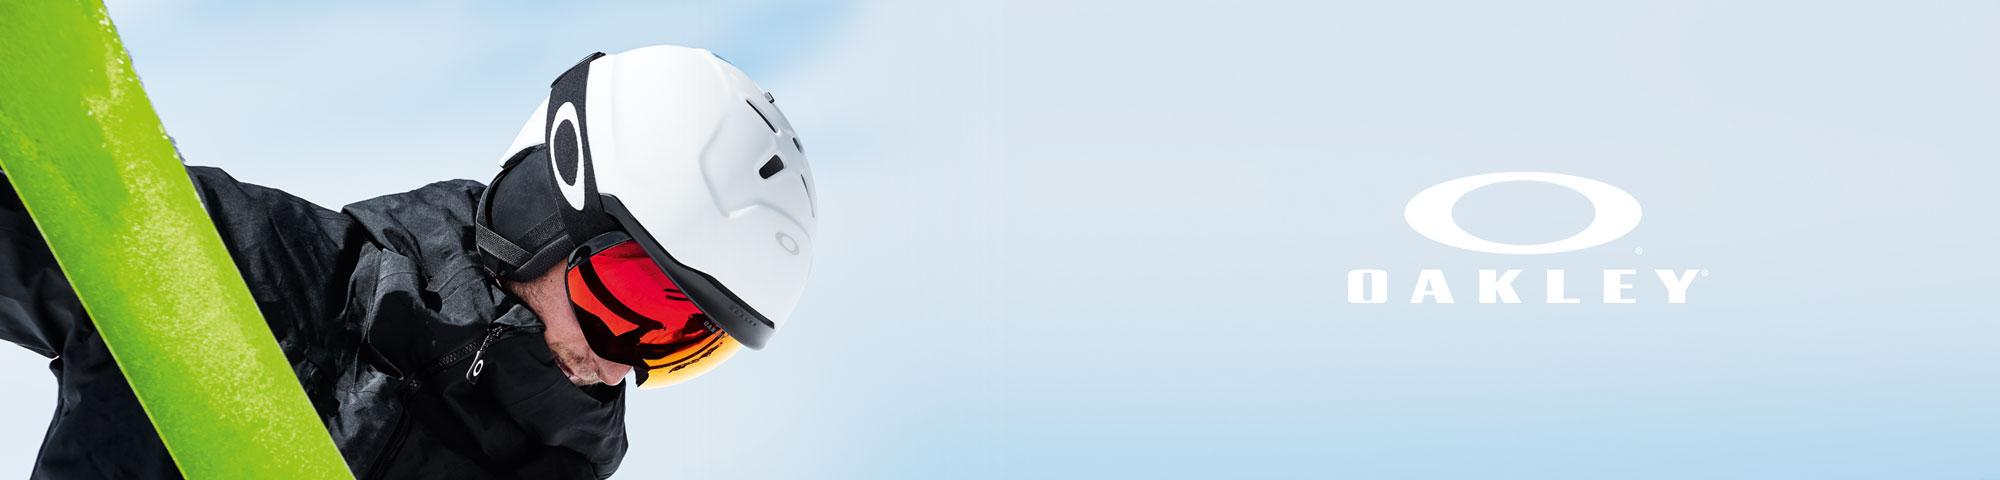 Oakley MOD 1 Youth Ski Helmet